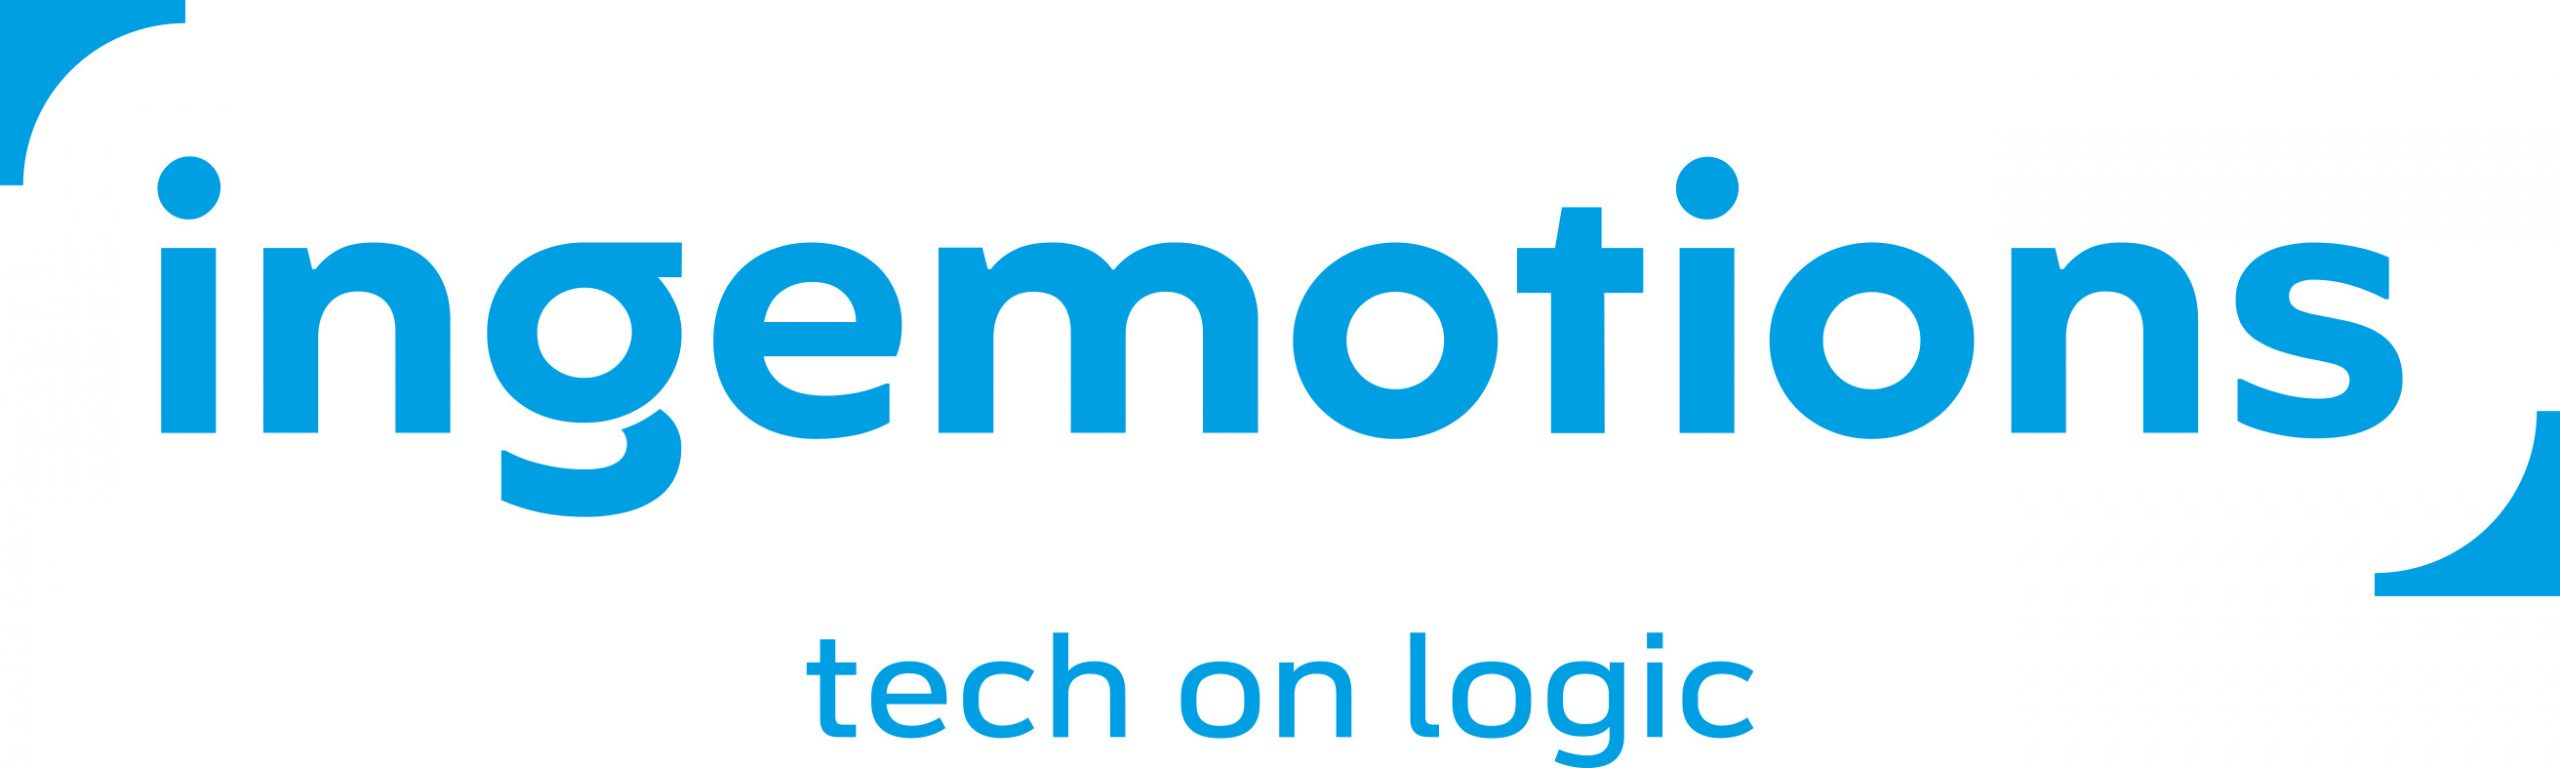 Logo Slogan Blue